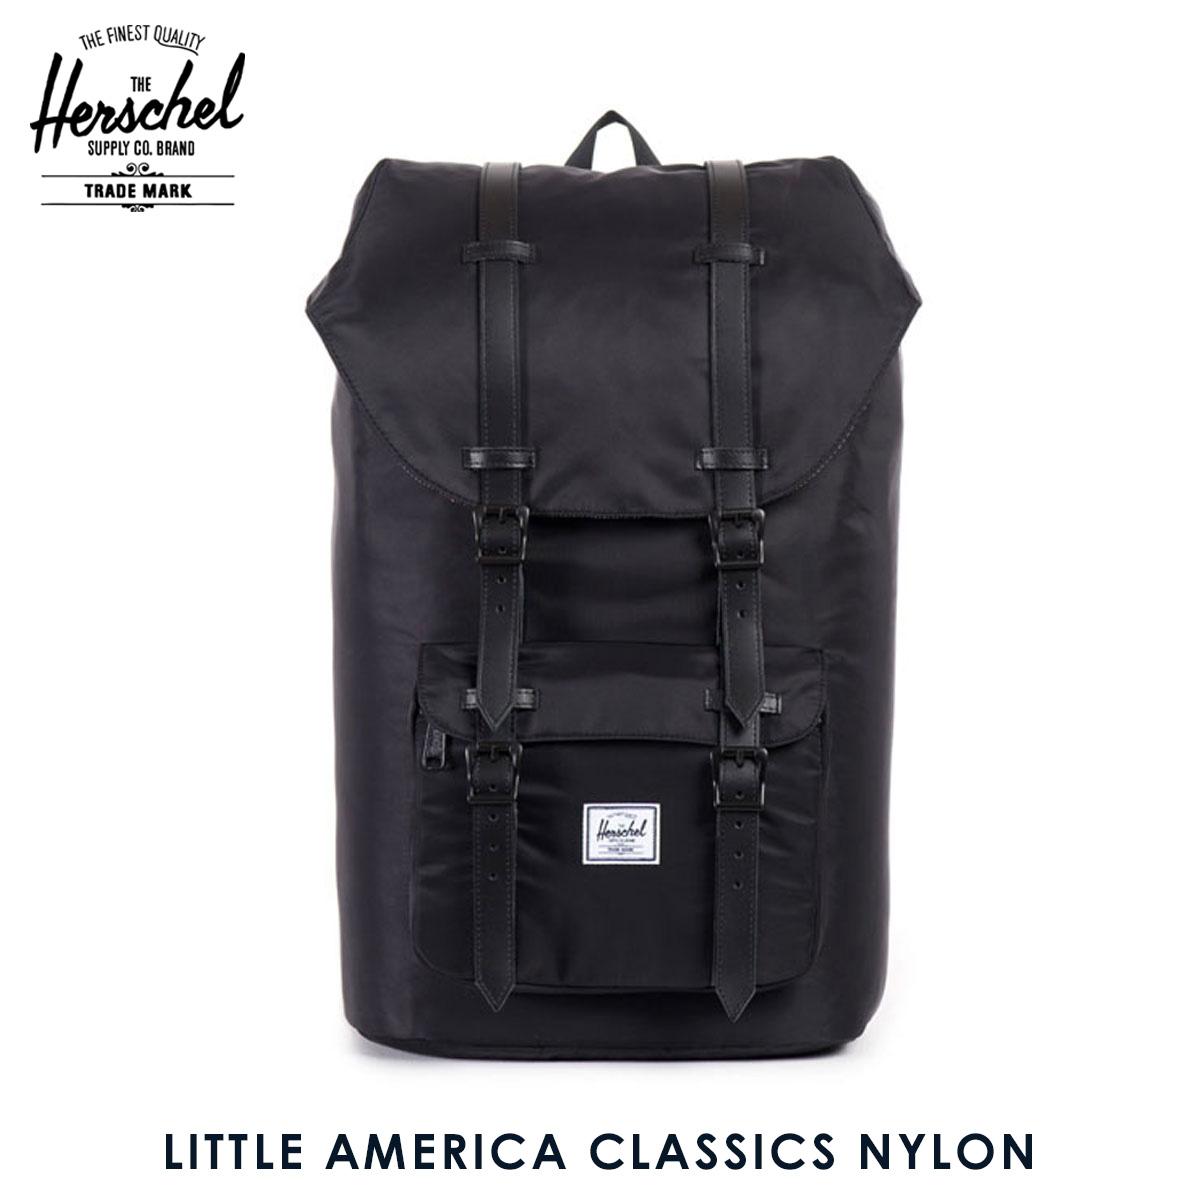 30%OFFセール 【販売期間 6/4 20:00~6/11 01:59】 ハーシェル バッグ 正規販売店 Herschel Supply ハーシャルサプライ バッグ リュックサック Little America Classics Nylon 10014-00727-OS Black D15S25 父の日